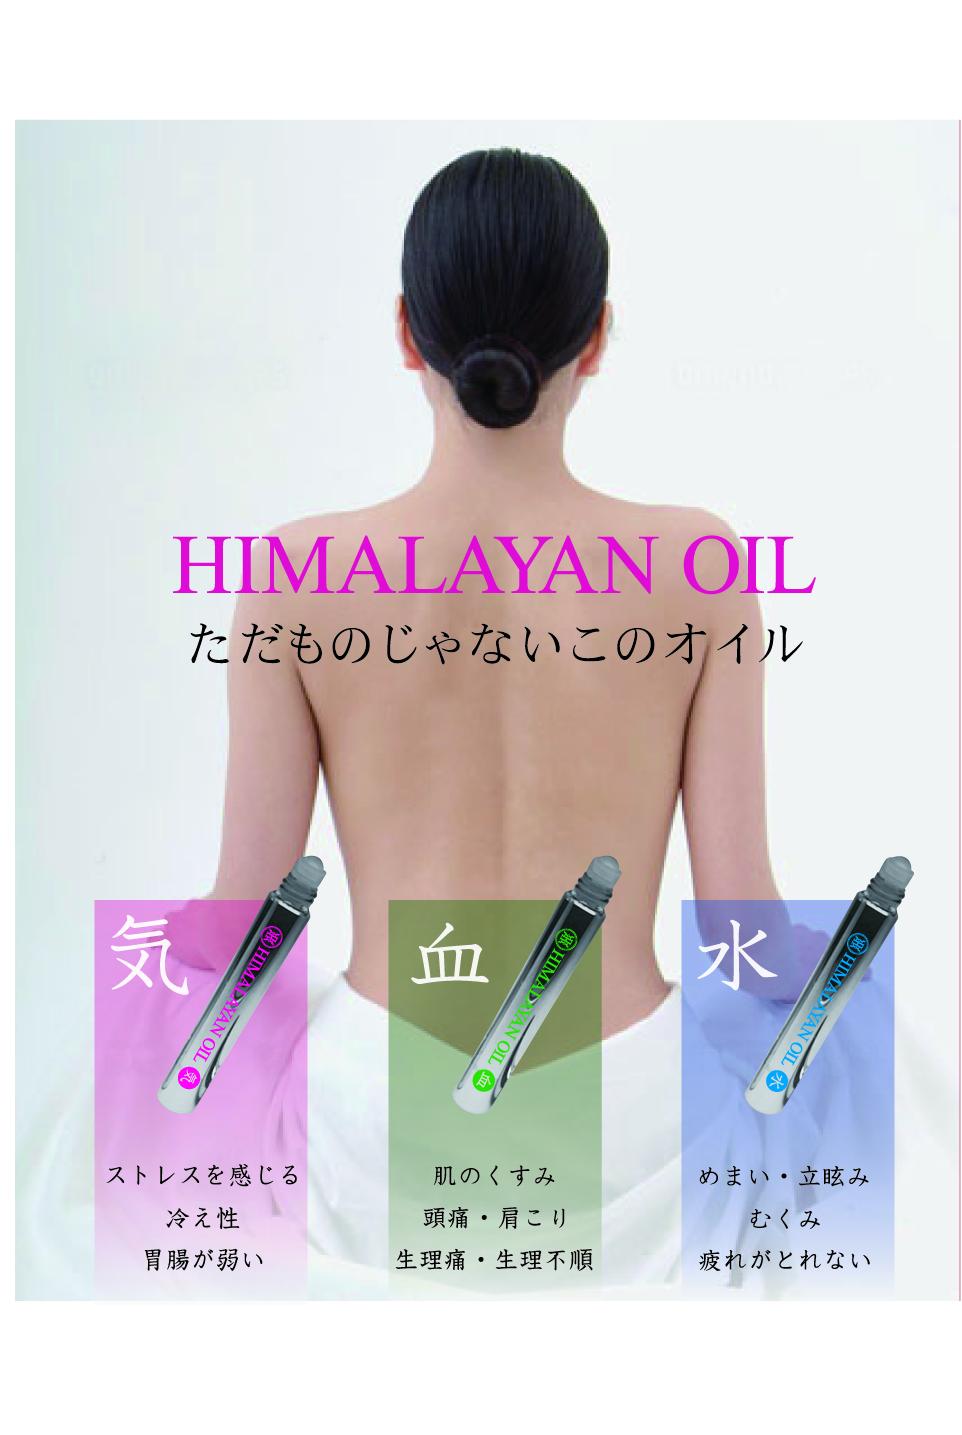 HIMALAYAN OIL基本デザイン画像最終